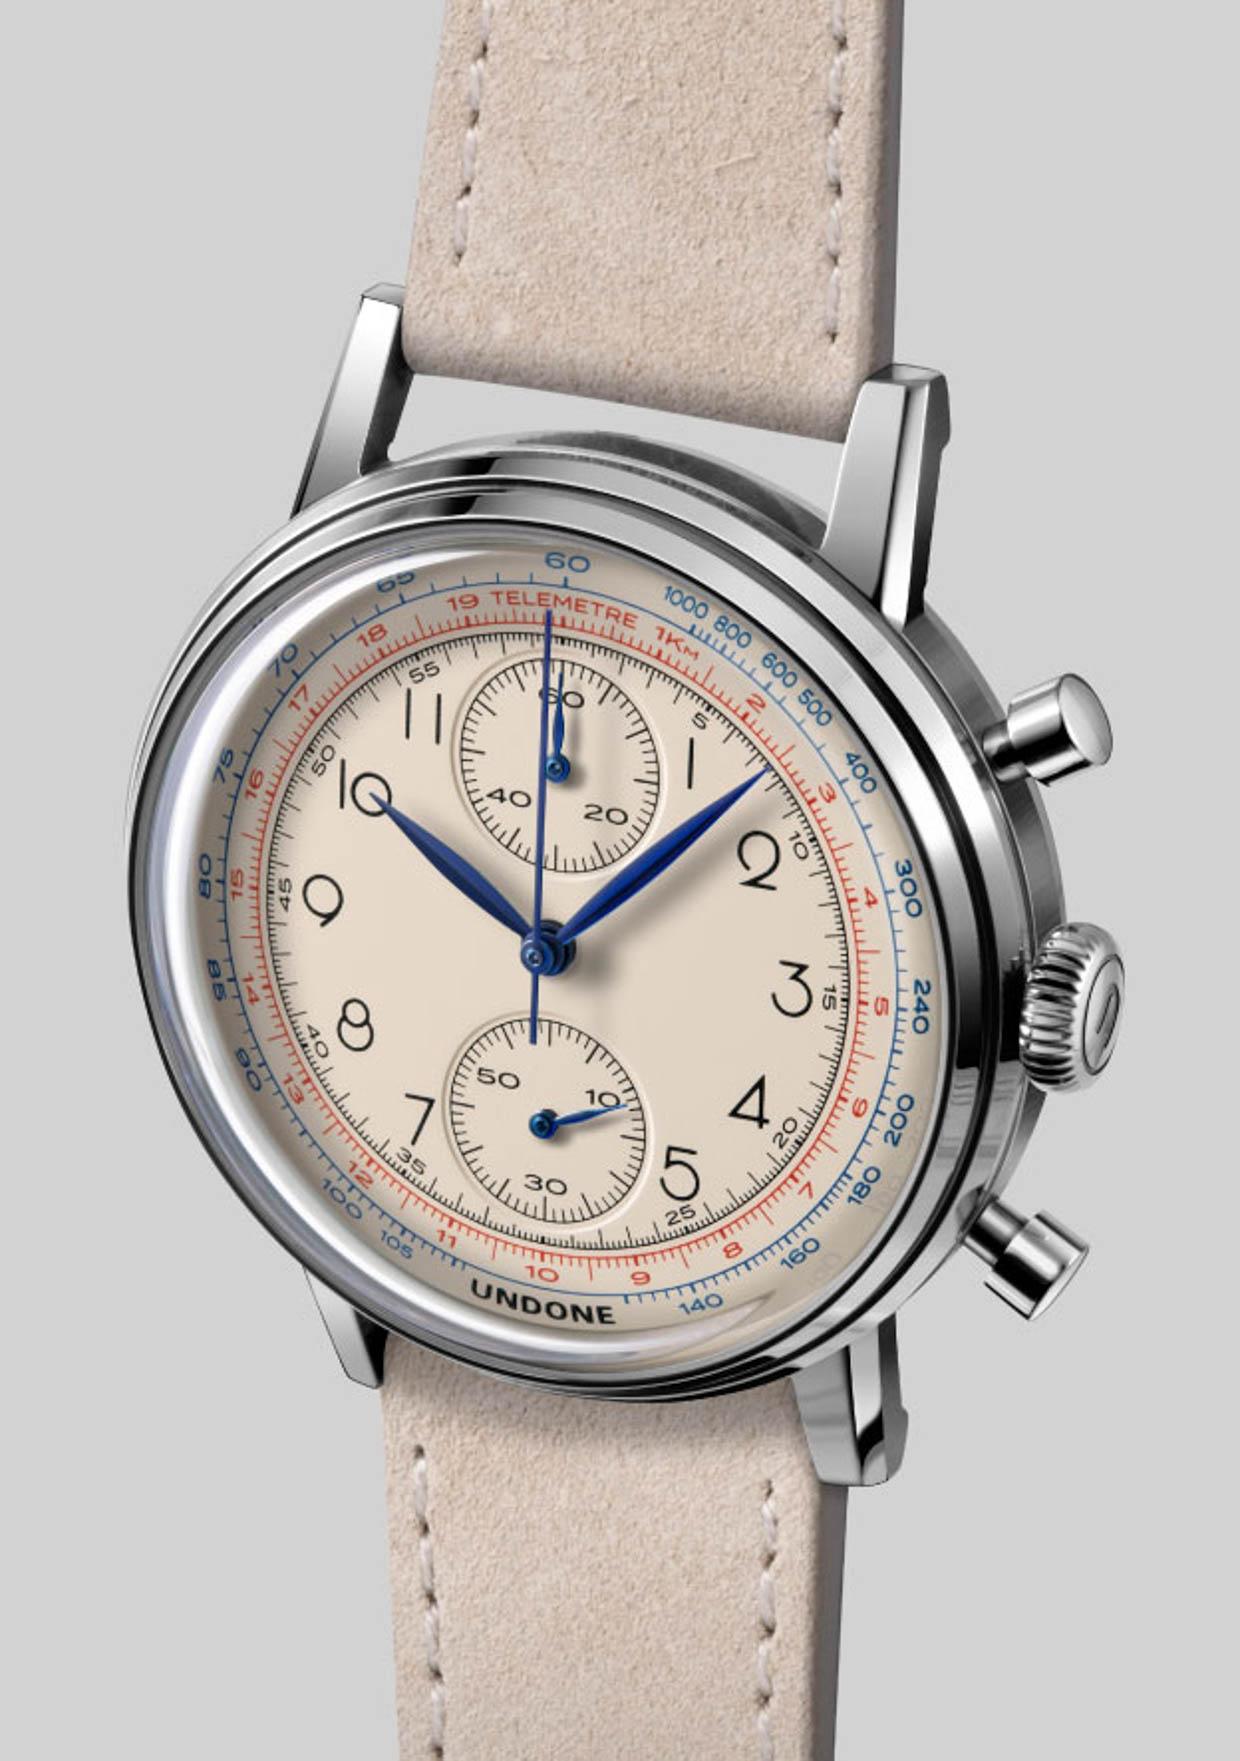 Undone Vintage Killy Watch